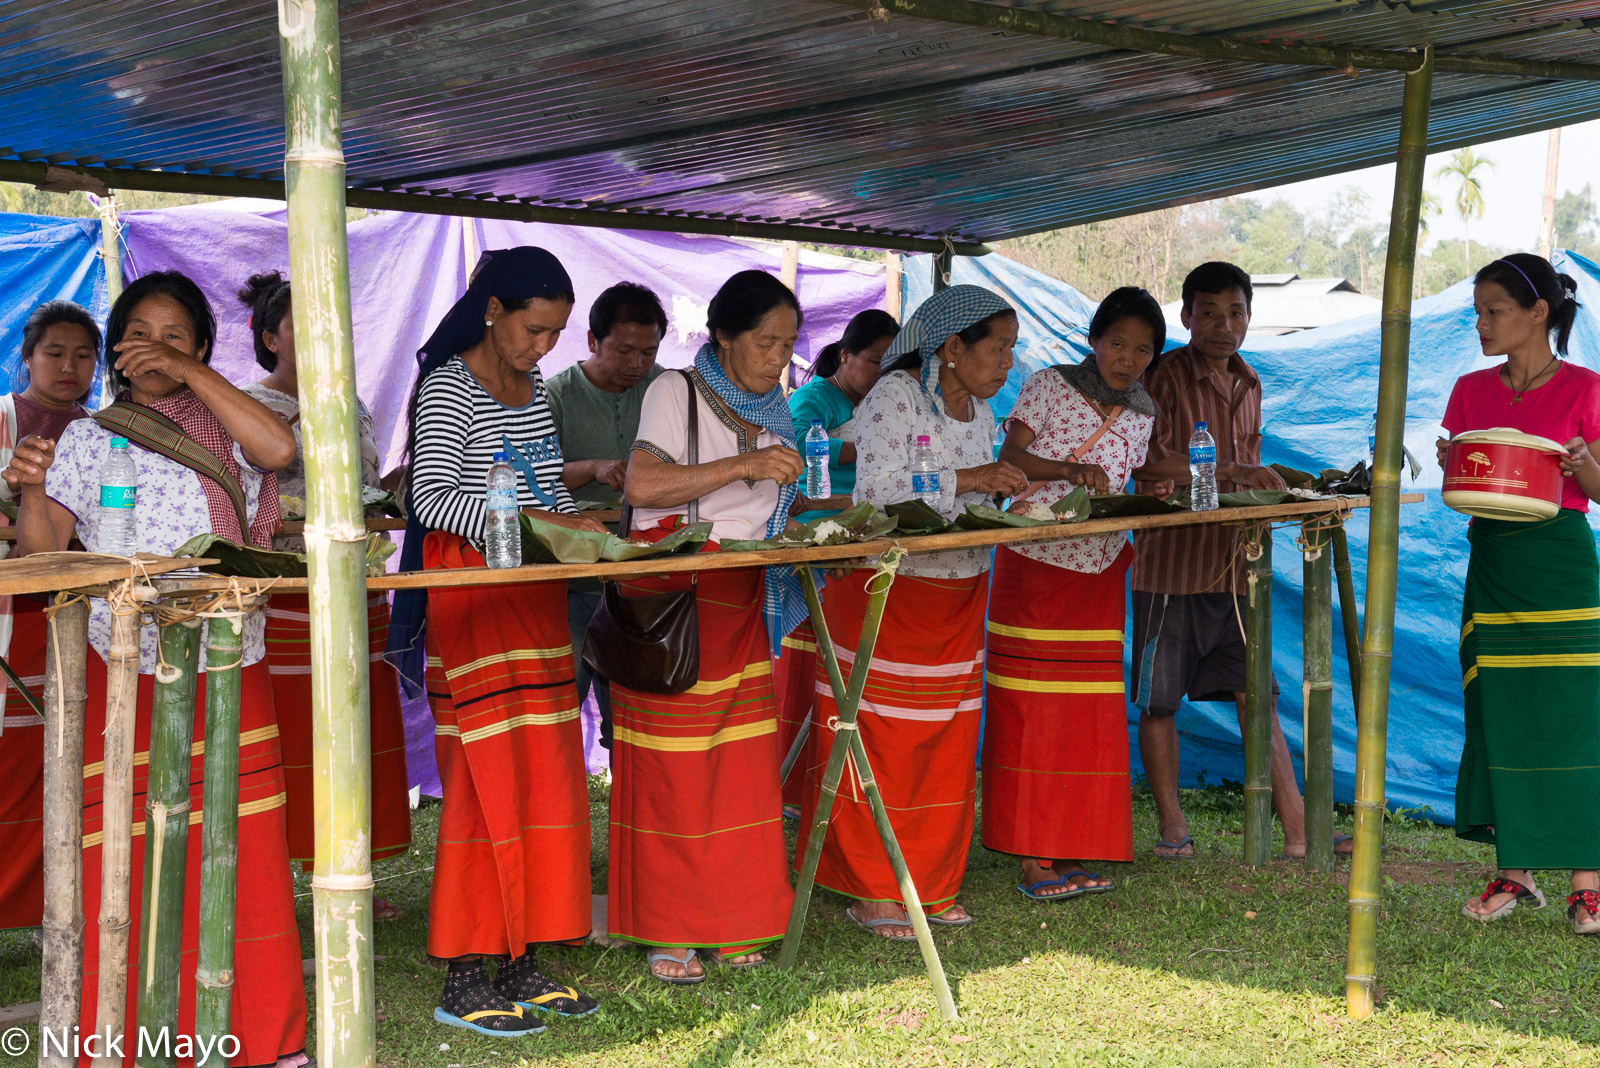 Adi, Arunachal Pradesh, Eating, Harvest Celebration, India, photo